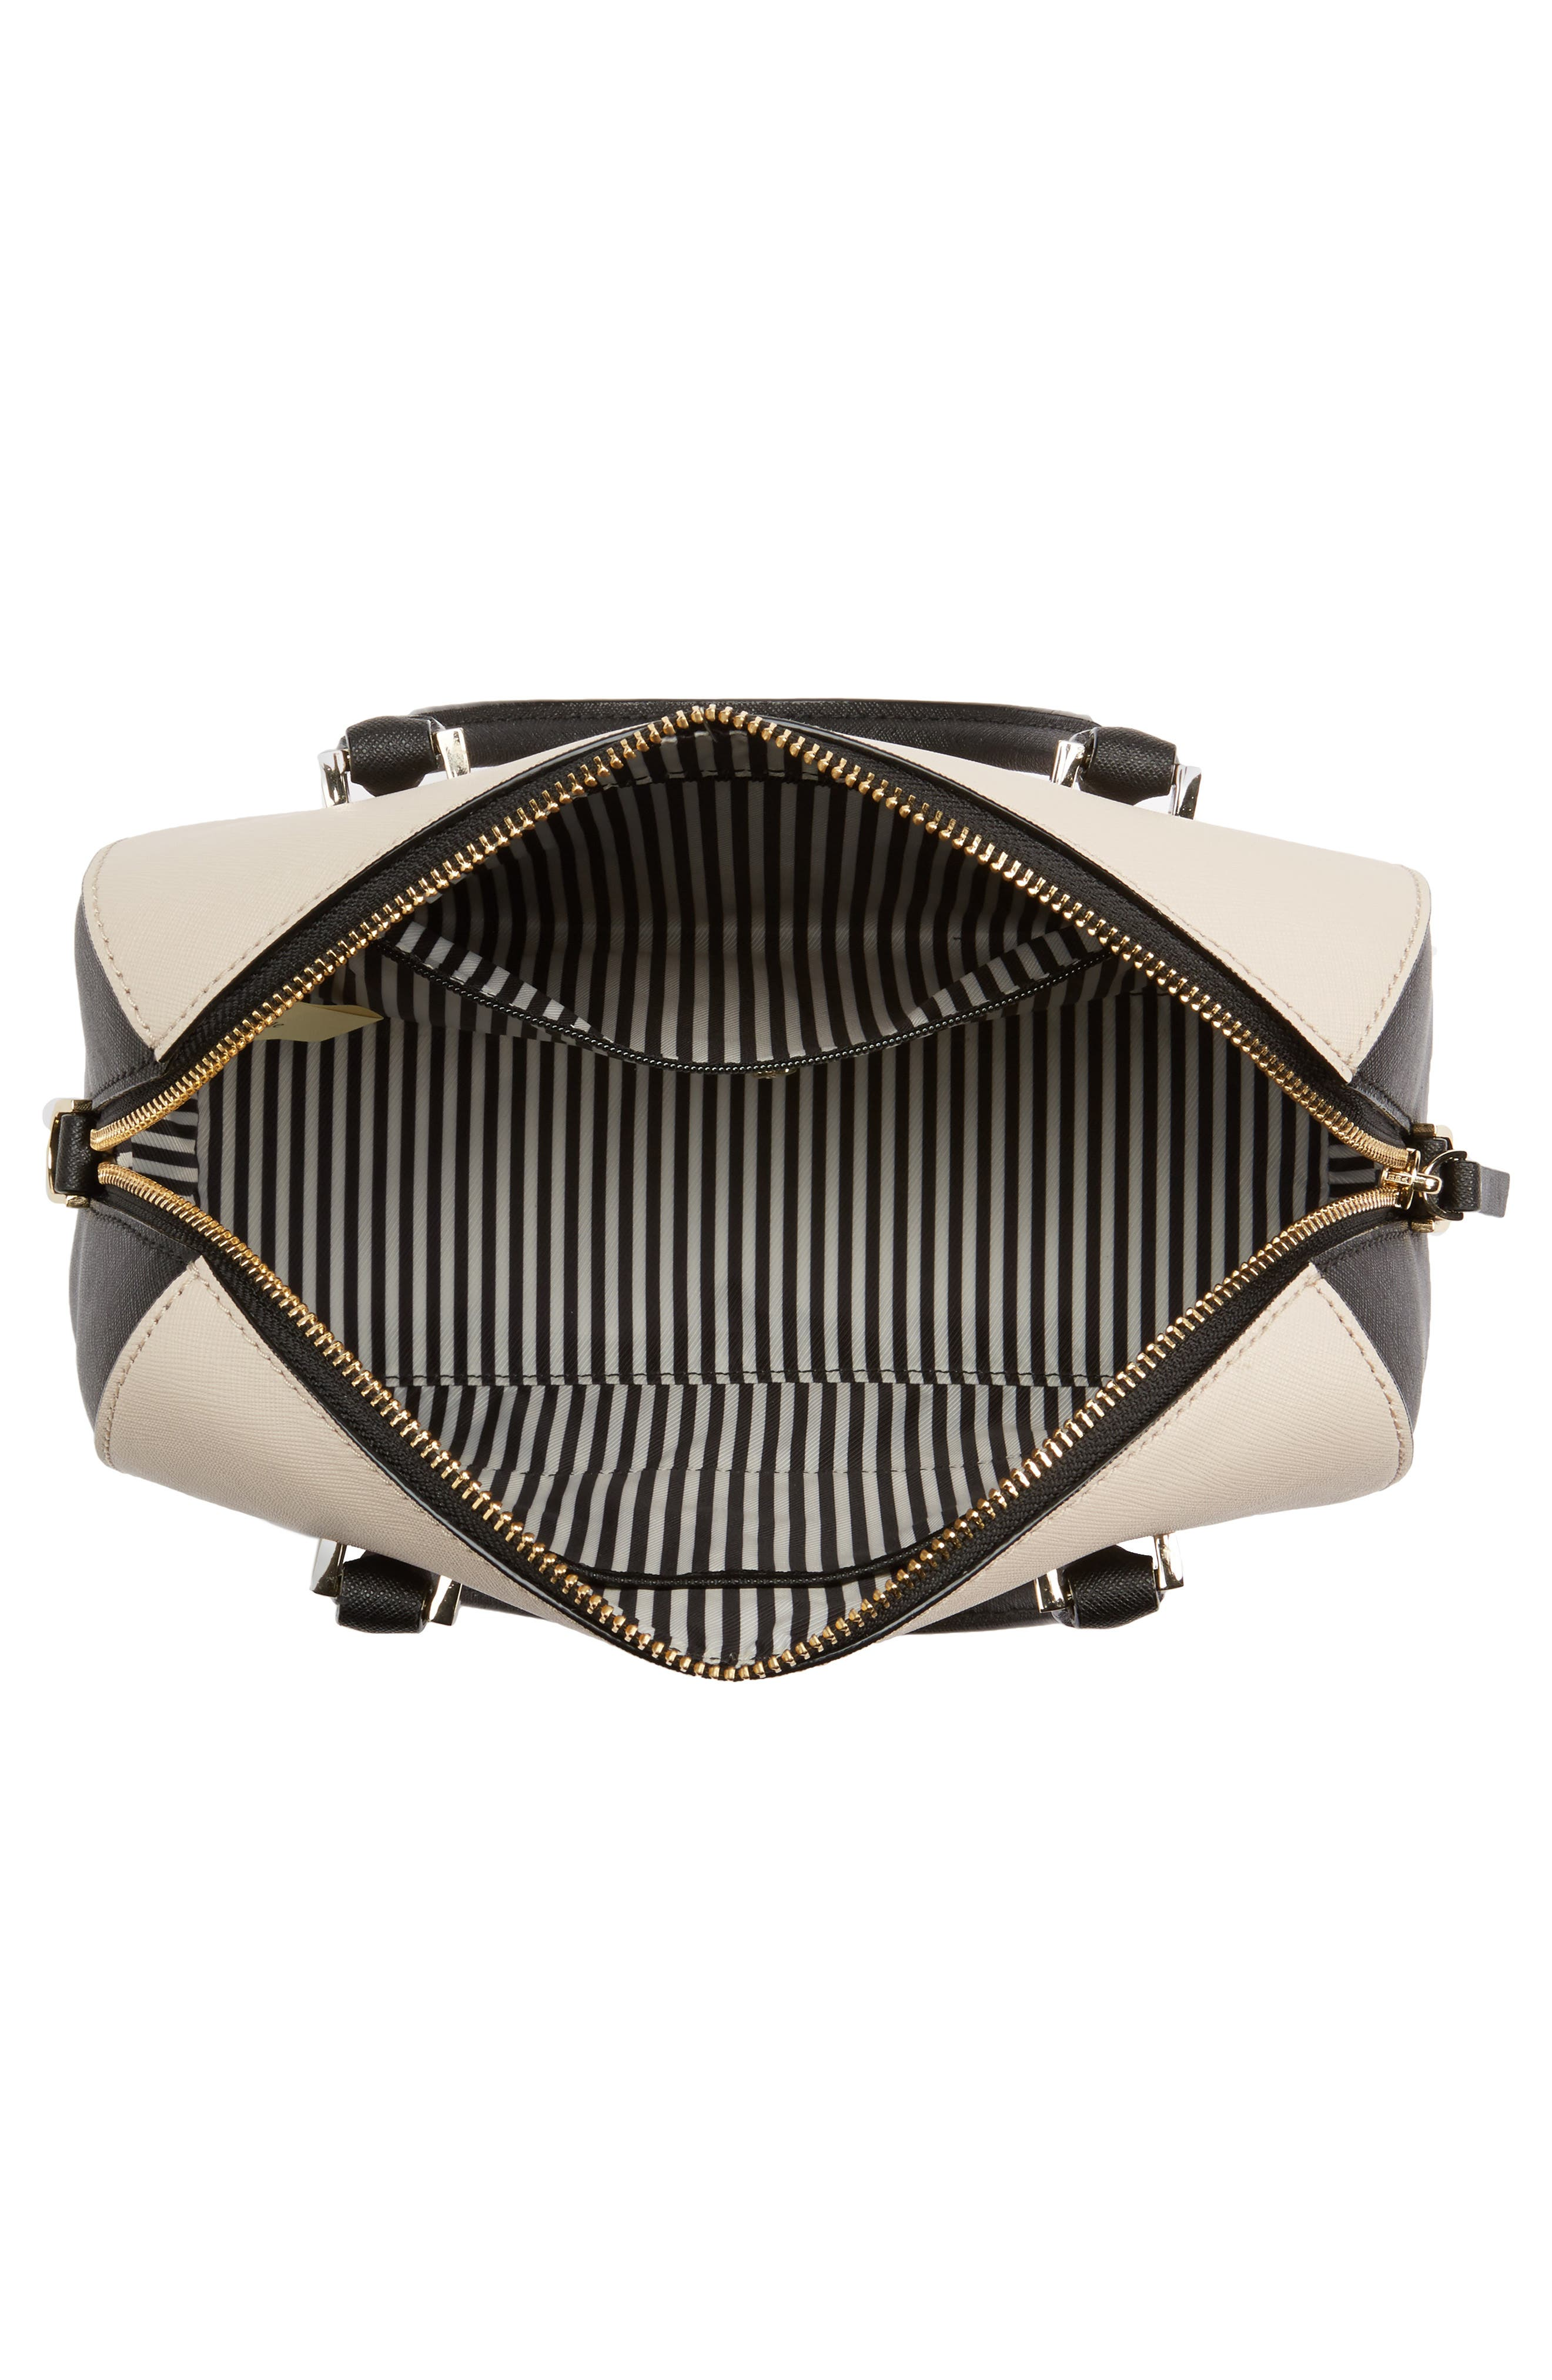 cameron street large lane leather satchel,                             Alternate thumbnail 4, color,                             005